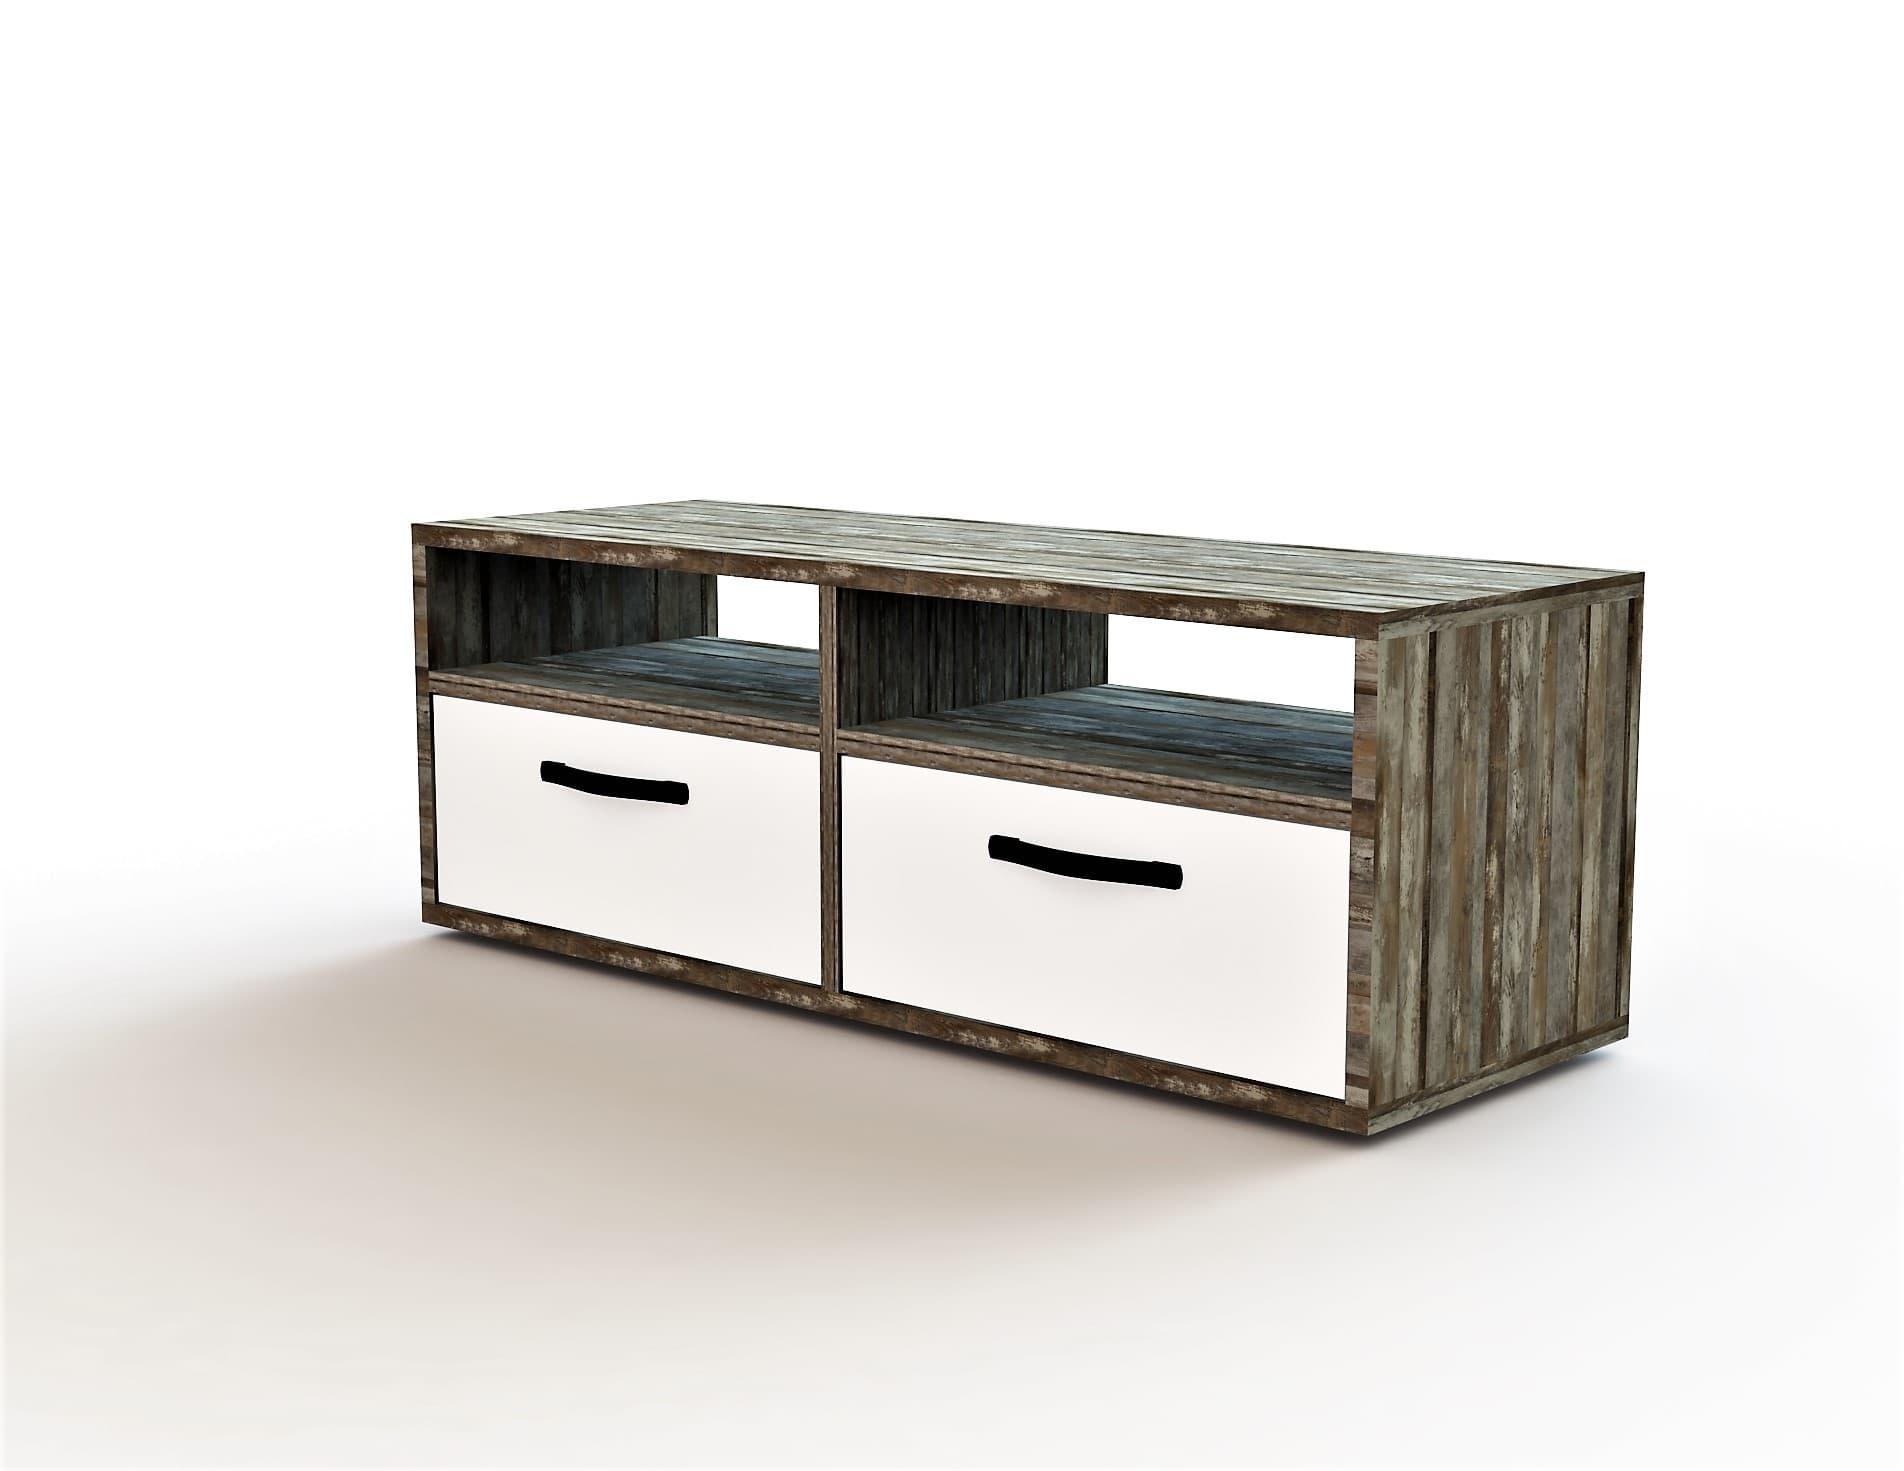 Comoda TV din pal, cu 2 sertare pentru copii Vicky II Alb / Driftwood, l120xA45,5xH45 cm imagine